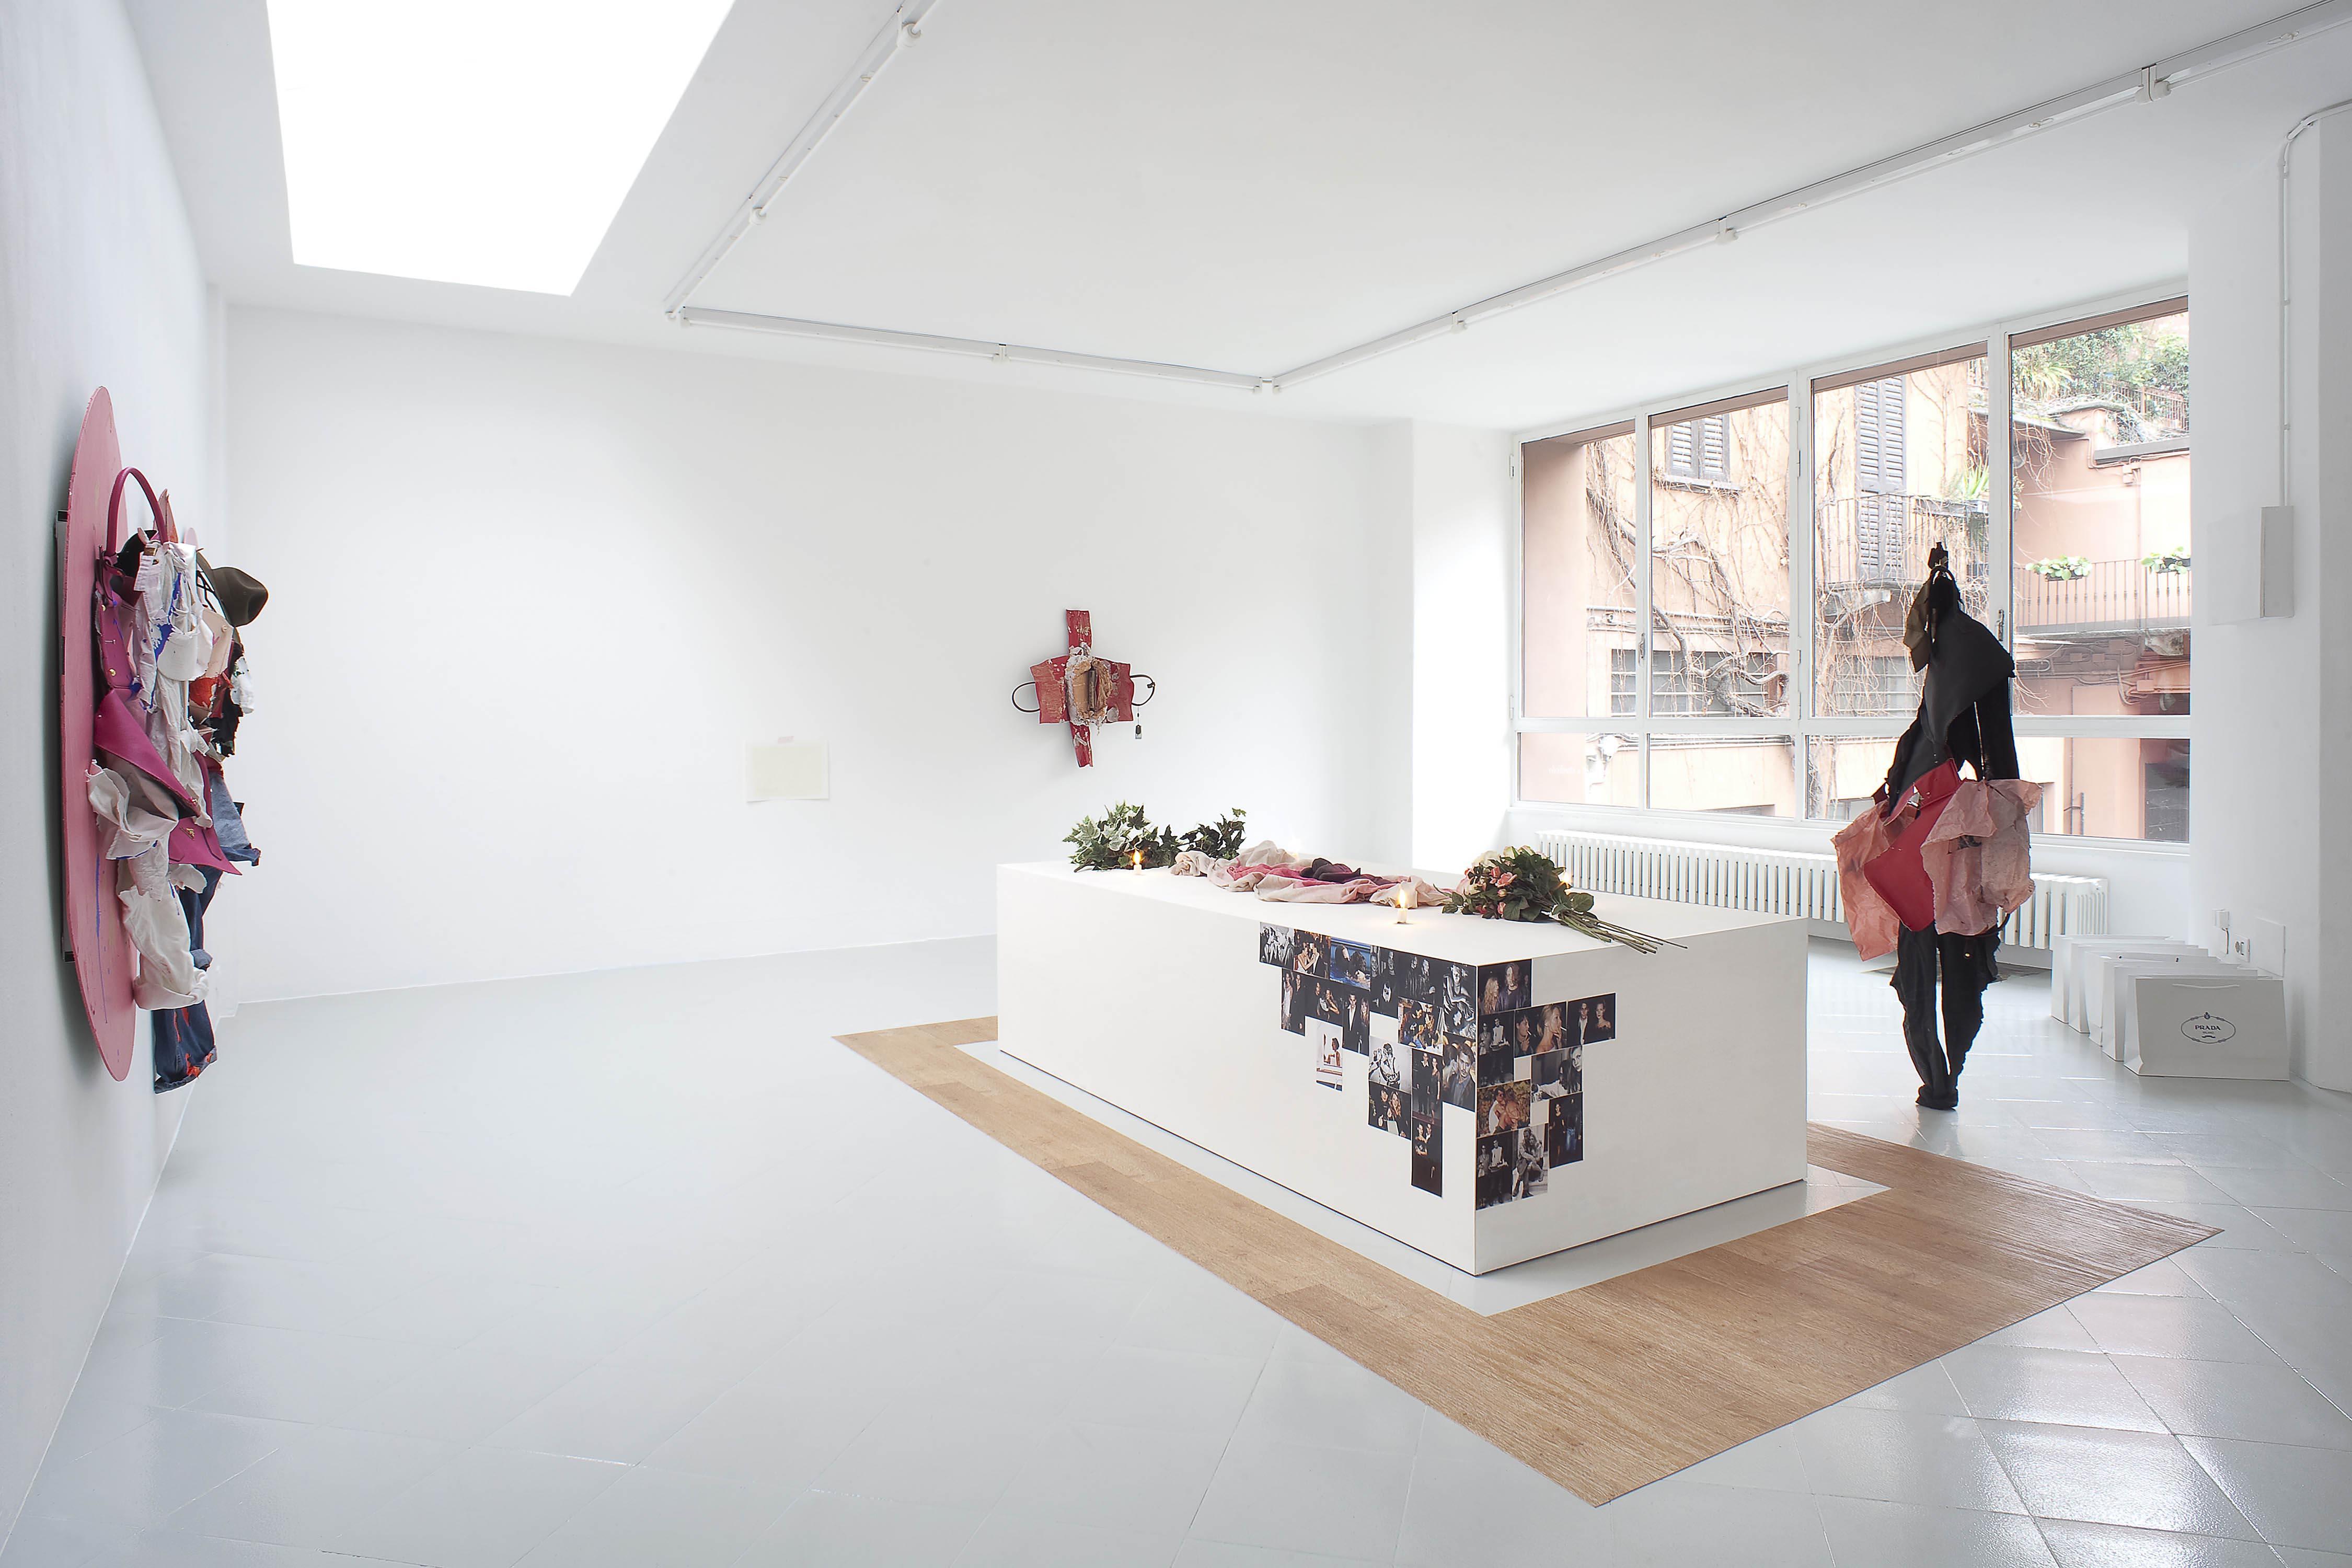 9 - Yves Scherer Installation view 2015 - Courtesy Studiolo Milan - Photo Filippo Armellin